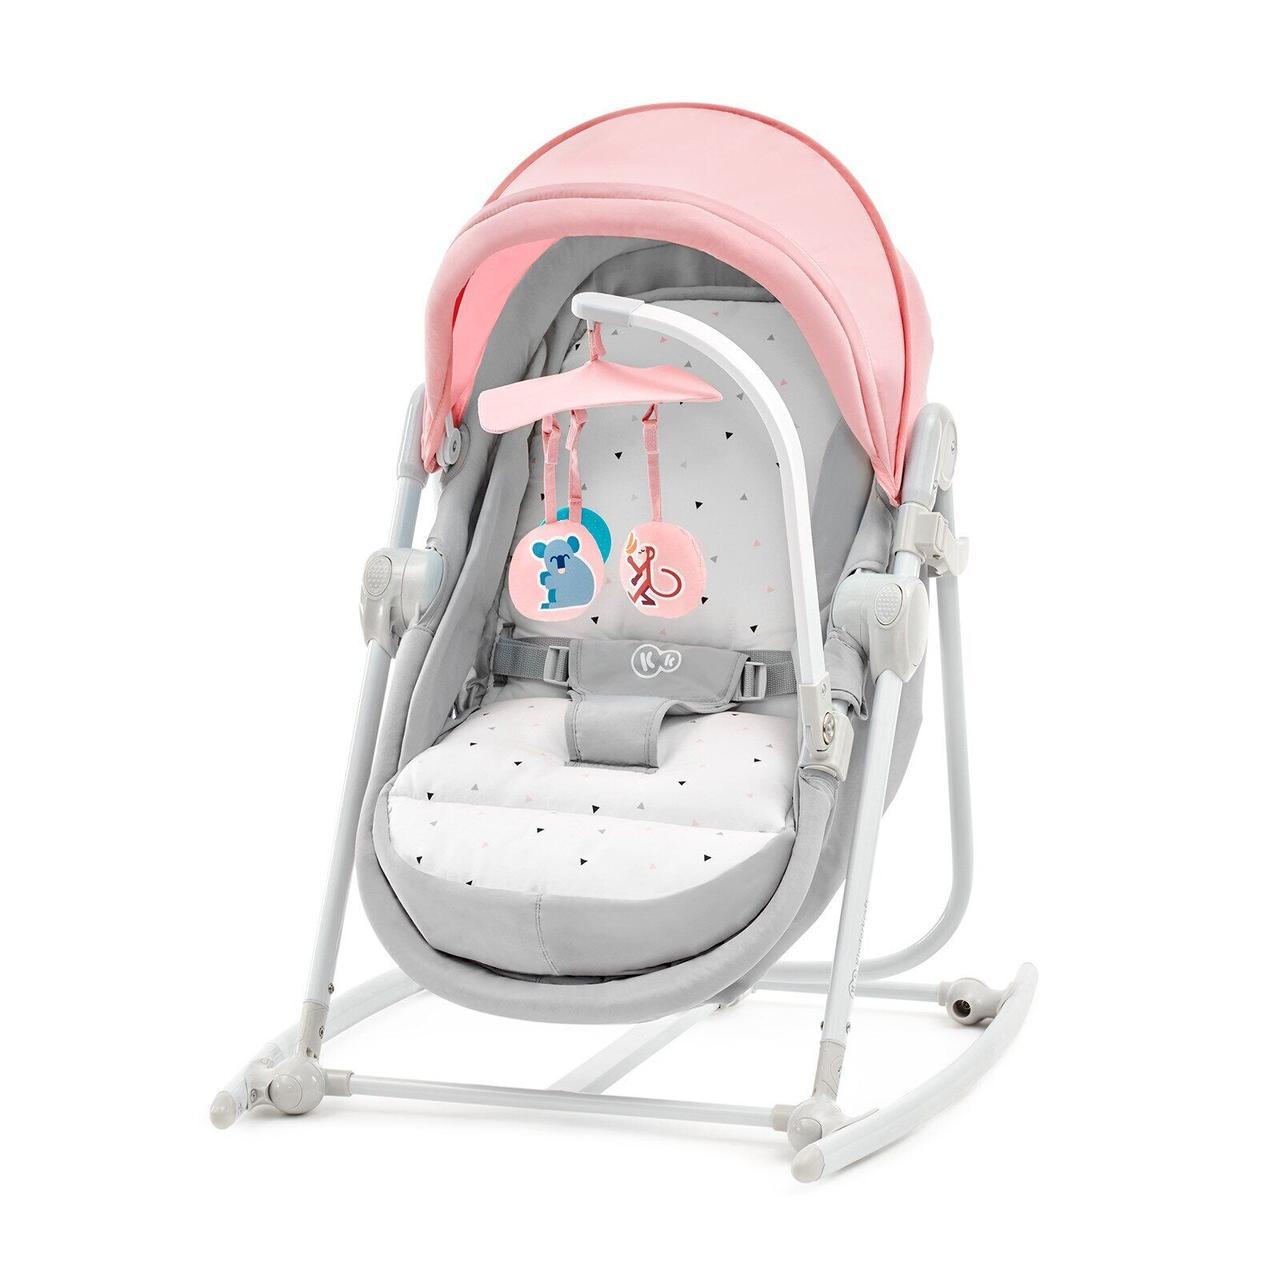 Шезлонг-качалка 5 в 1 Kinderkraft Unimo Pink (KKBUNIMPNK0000)